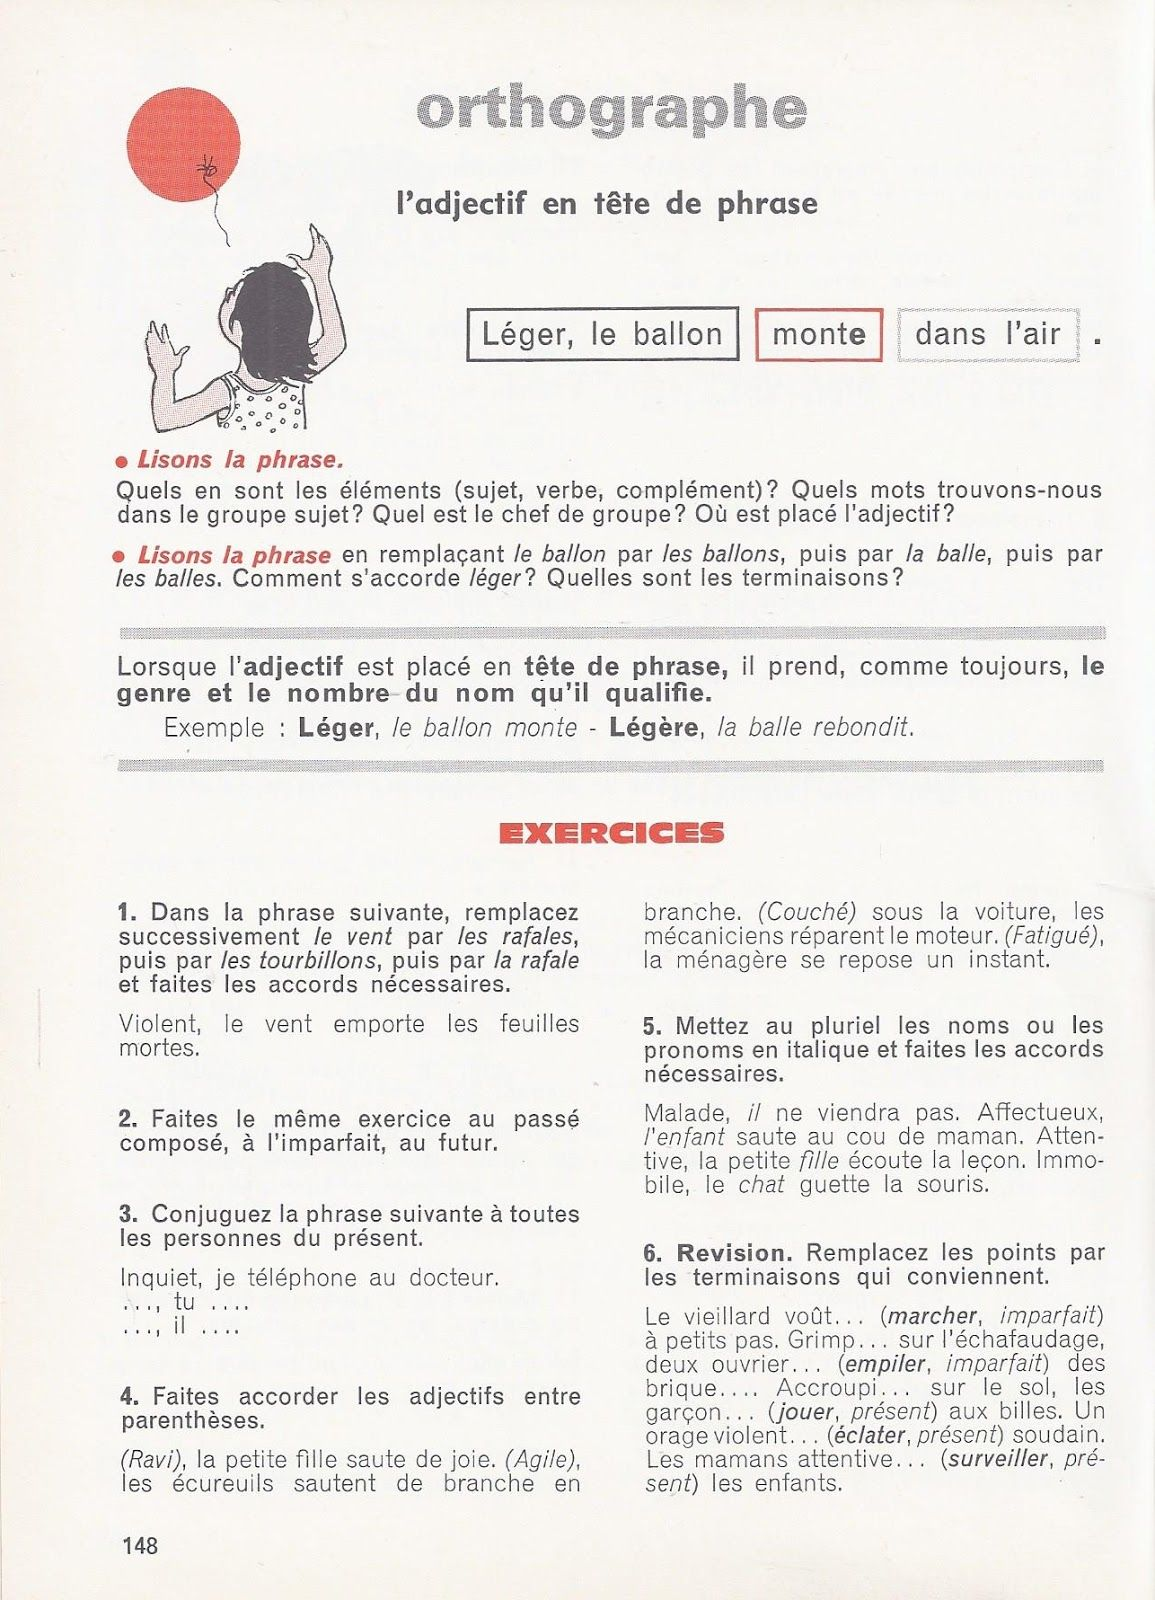 Tel, tels, telle, telles ? - Question Orthographe Voltaire